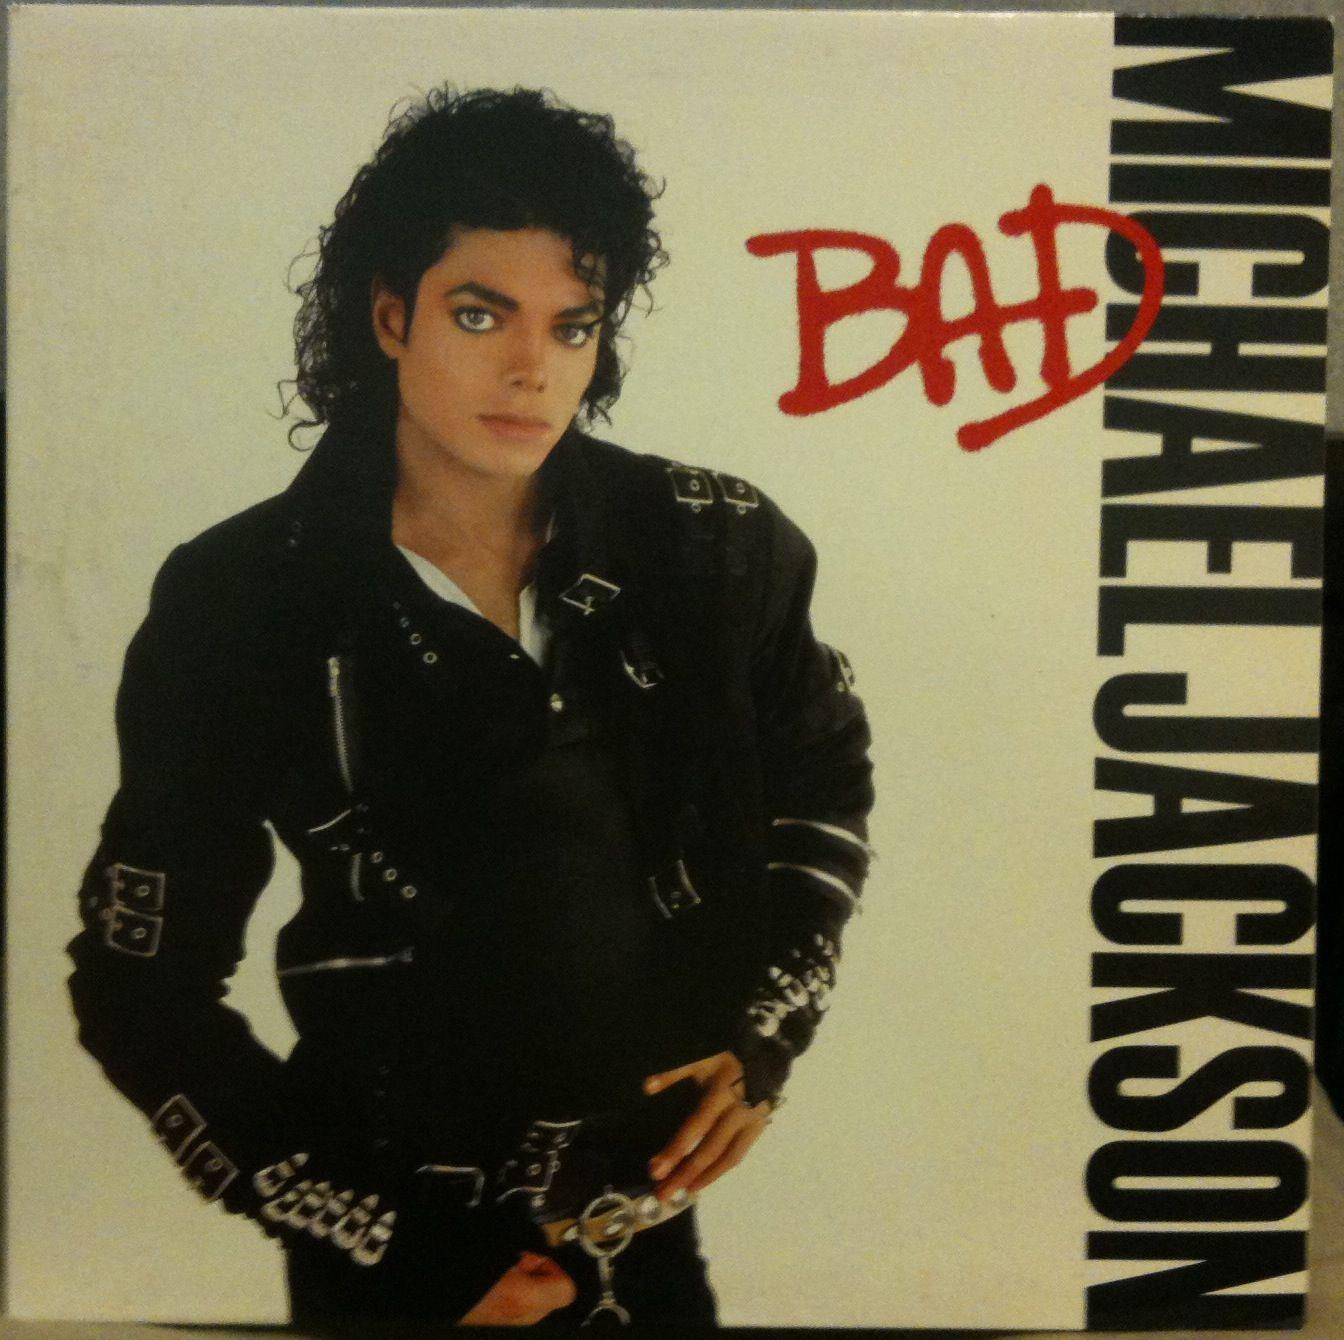 Michael Jackson Bad LP Vinyl OE 40600 VG 1987 1A 1c